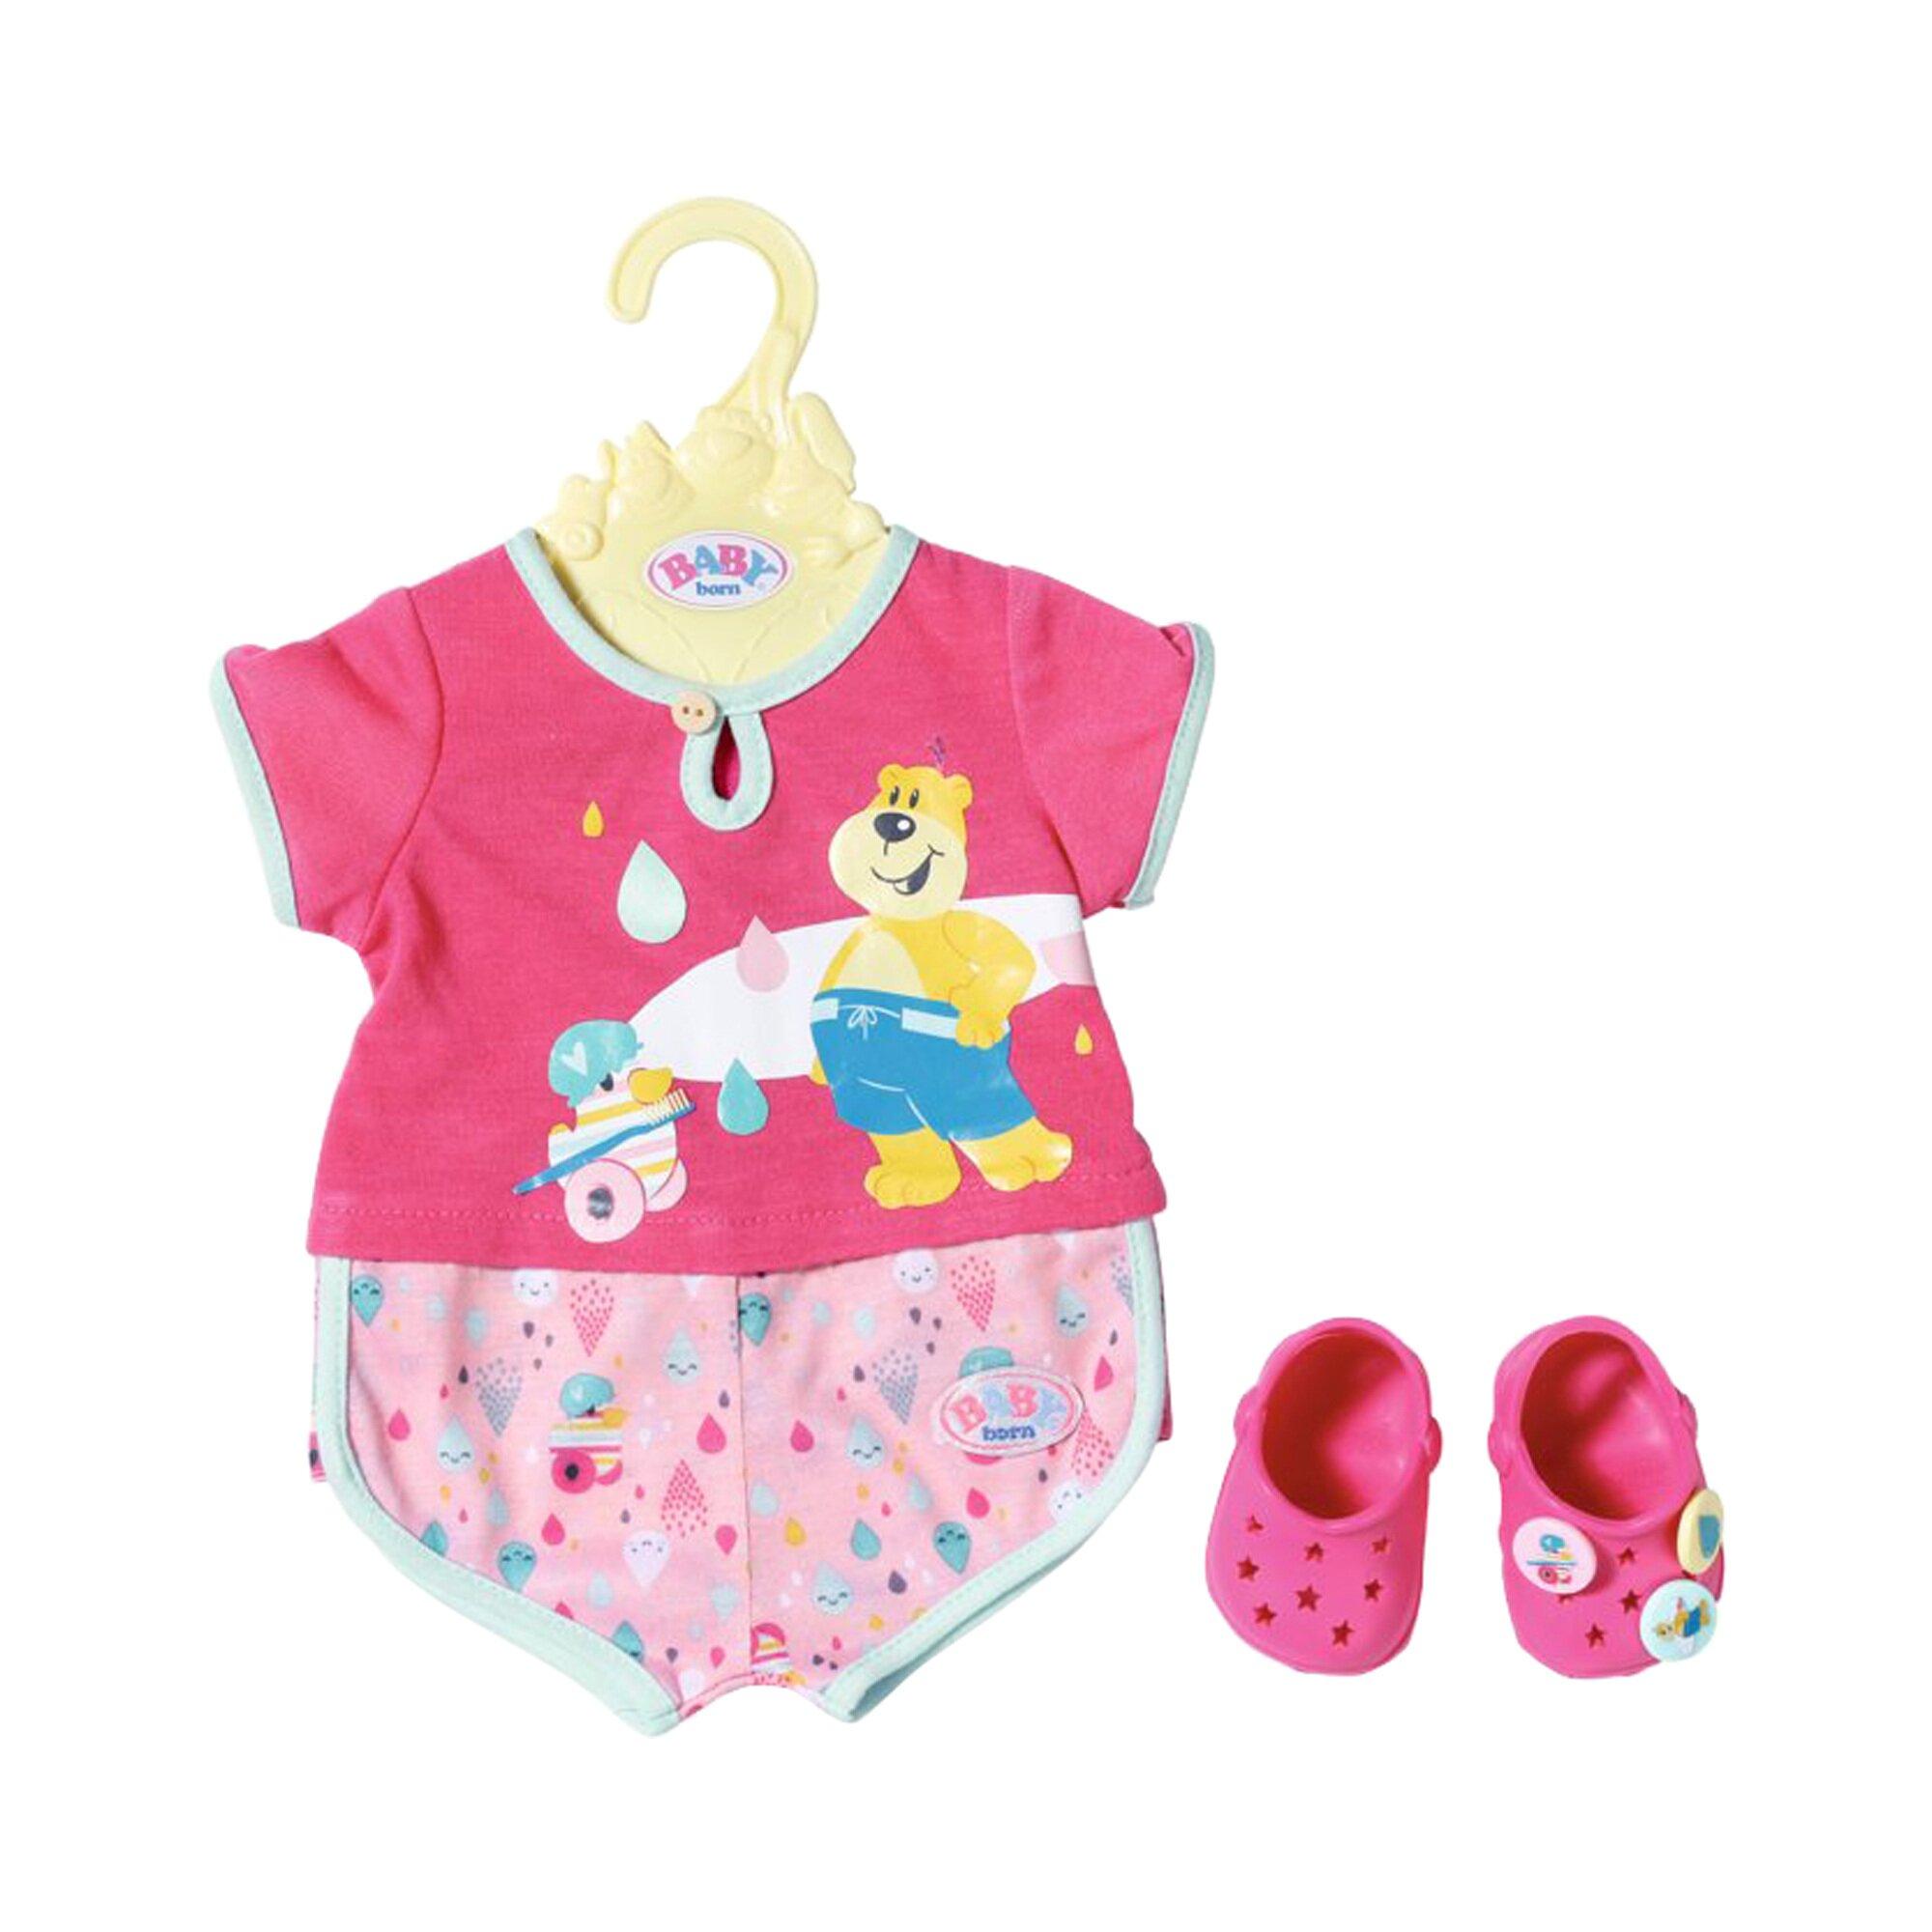 baby-born-puppen-outfit-baby-born-bath-pyjamas-clogs-43cm